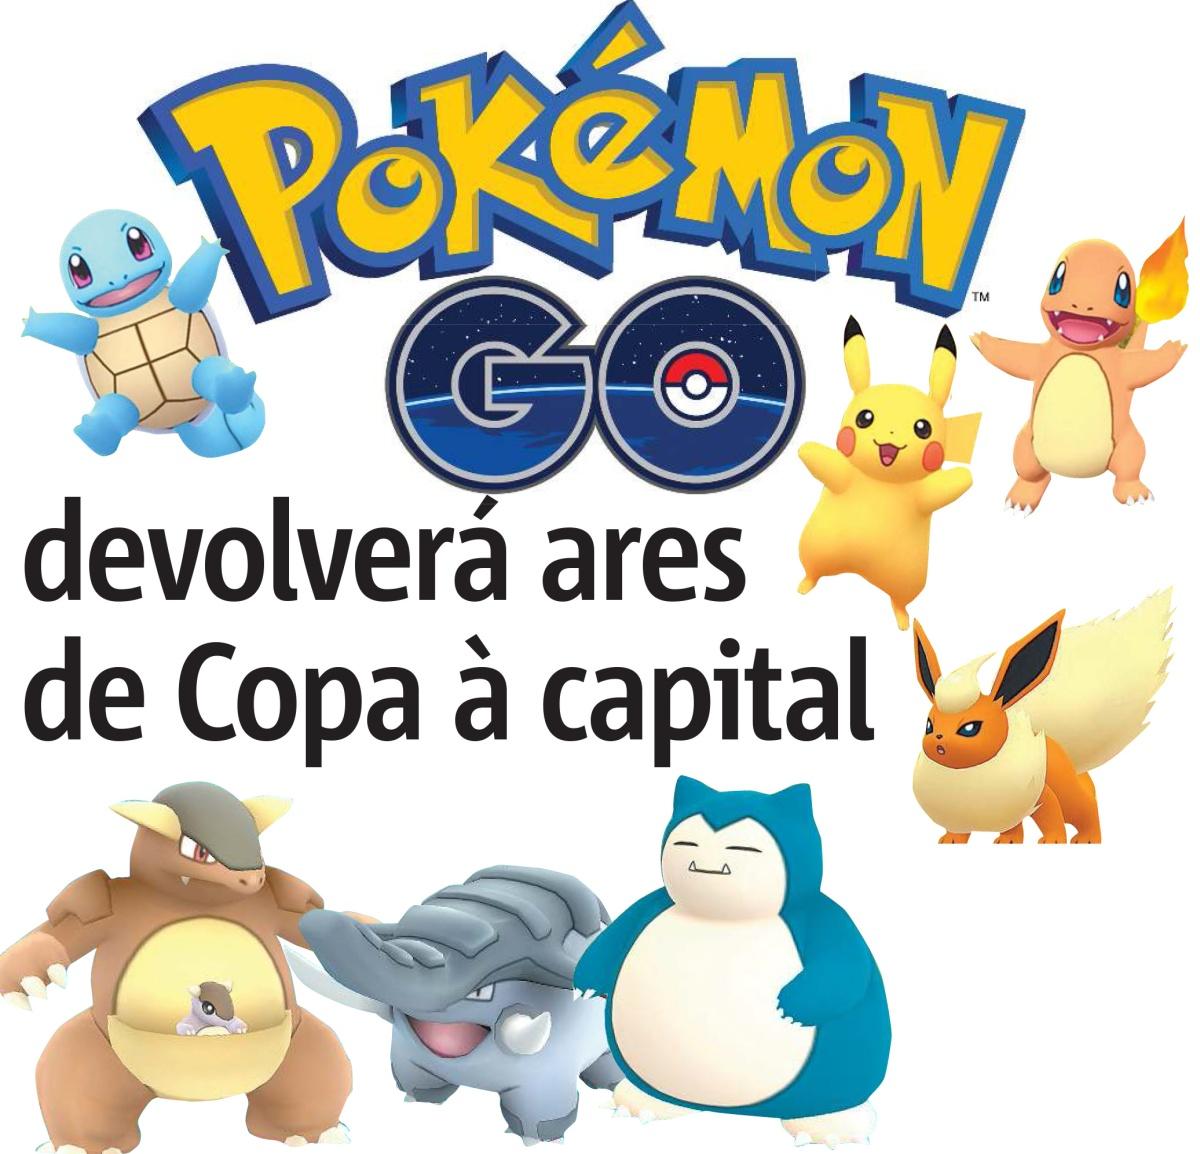 Pokemon GO devolverá ares de Copa a Porto Alegre